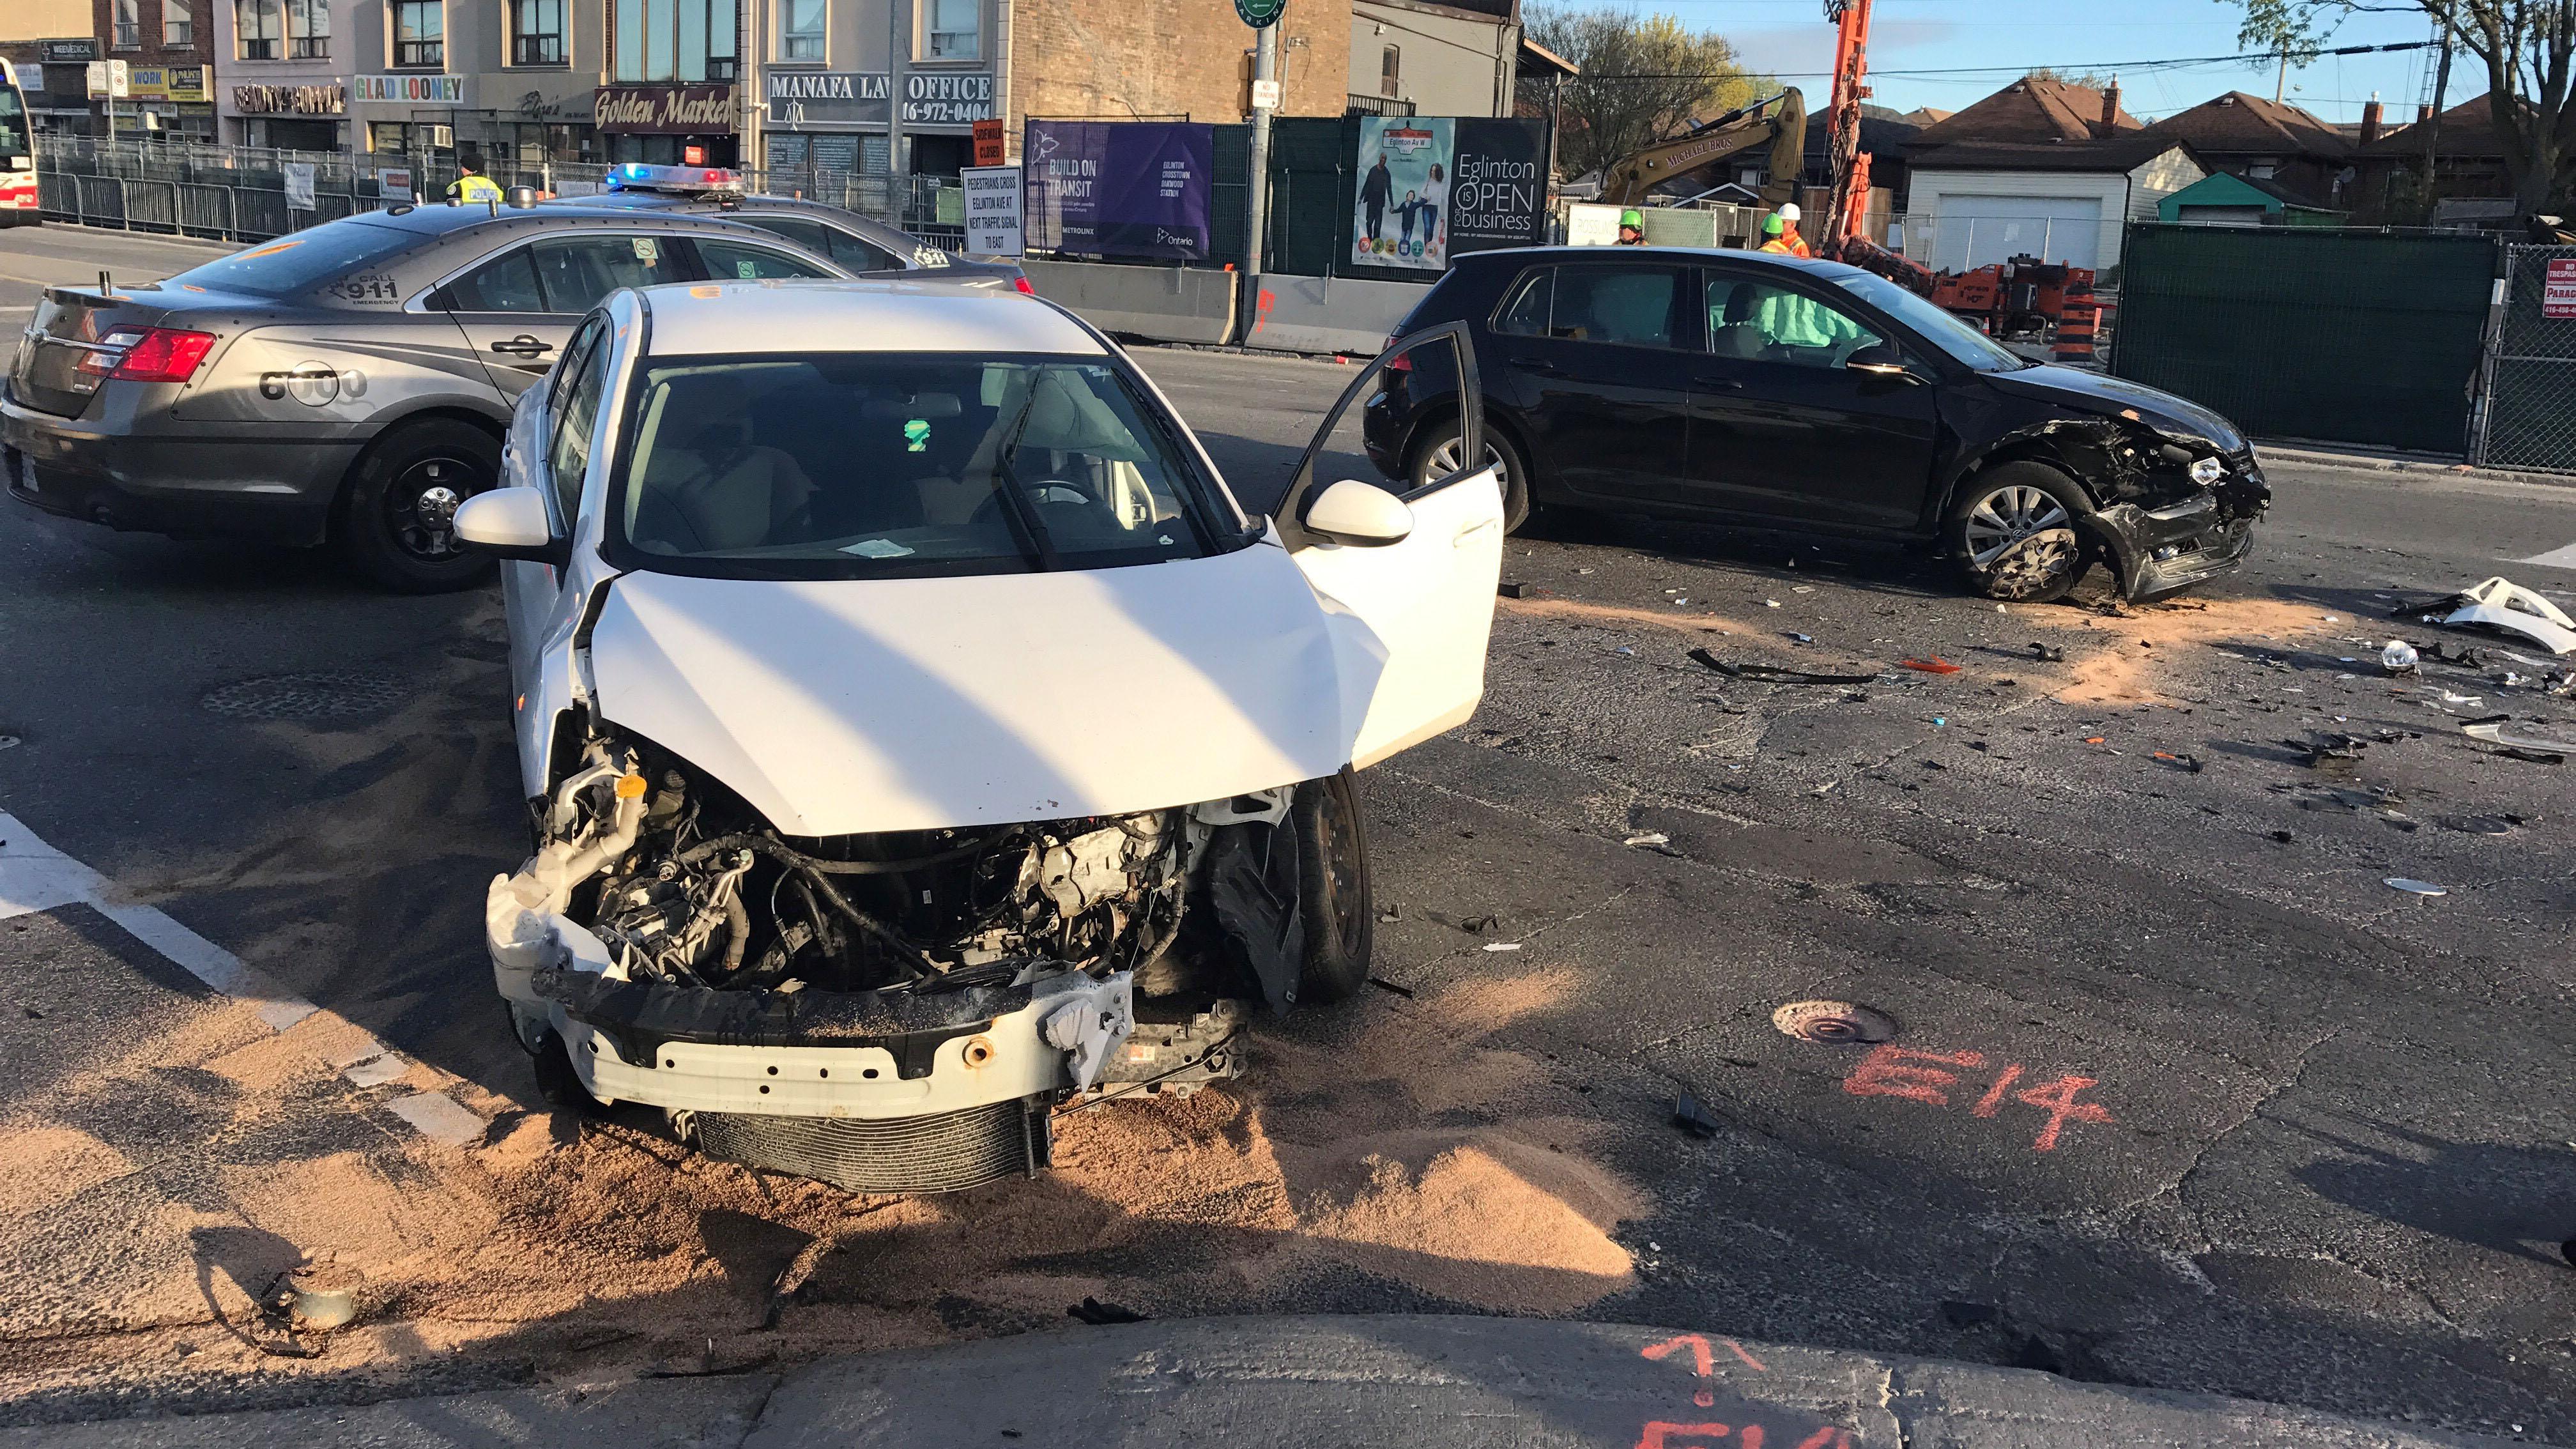 1 in hospital after Oakwood and Eglinton crash